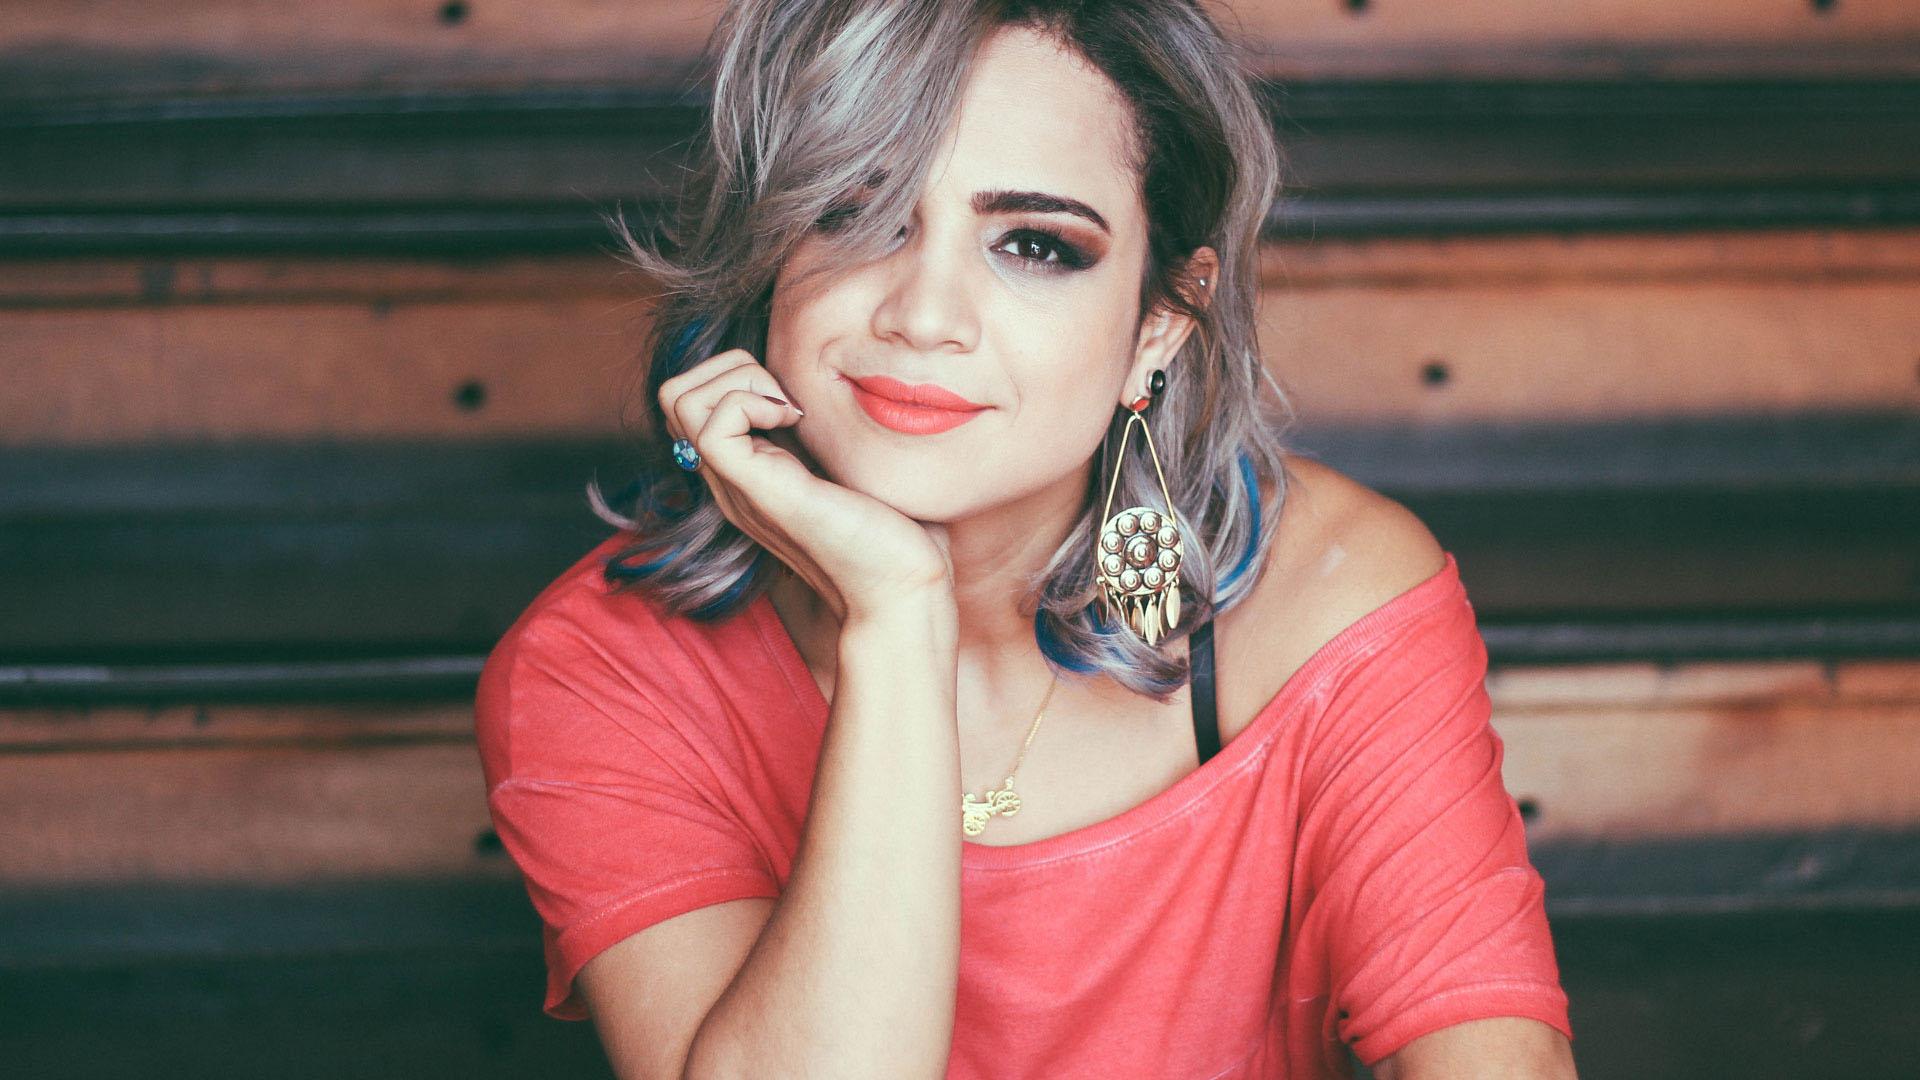 Hipocrisia? Daniela Araújo condena uso de drogas na internet